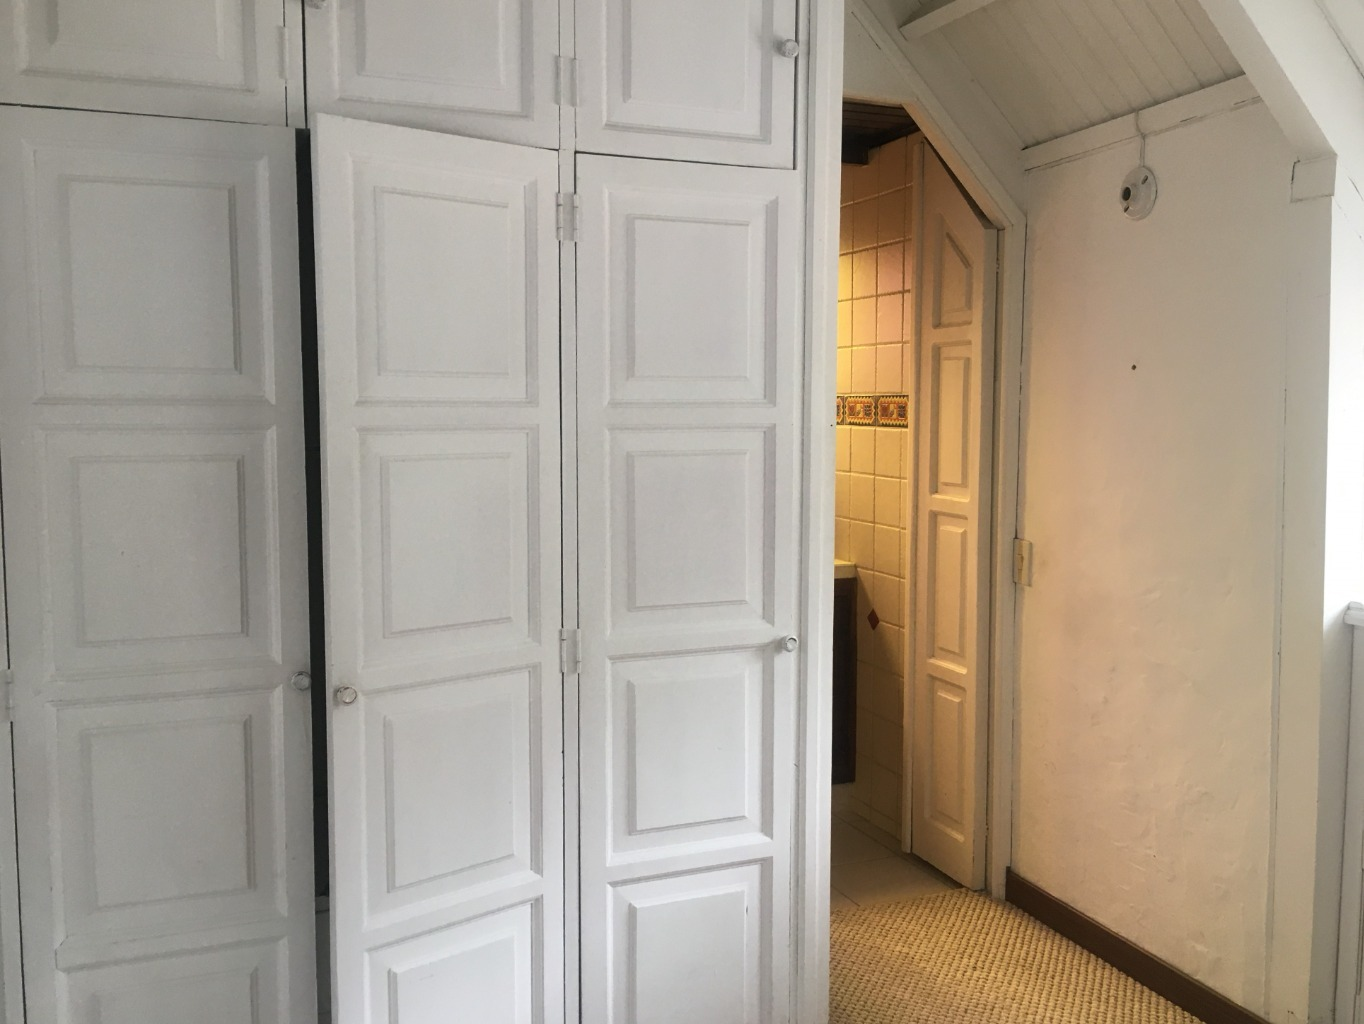 Casa en La Calera 16125, Photo13